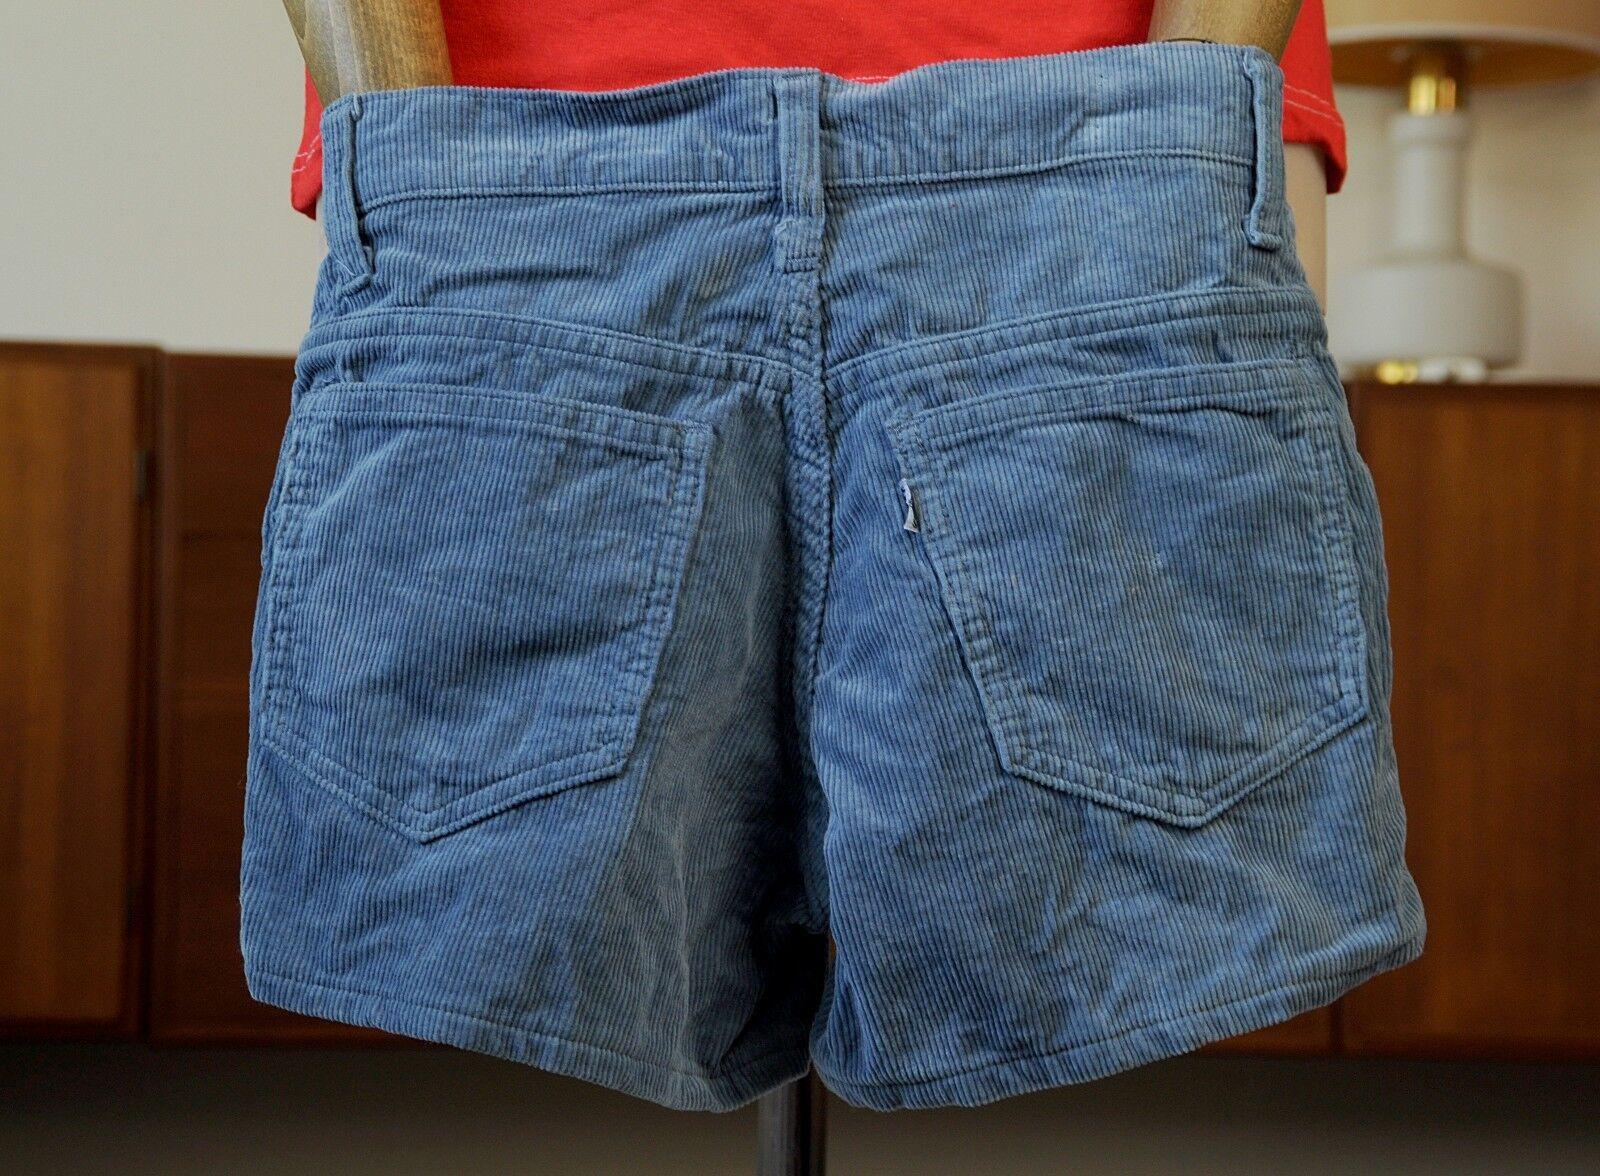 levis damen hose shorts hot pants blau 80er true vintage 80 s blue women kurz eur 25 74. Black Bedroom Furniture Sets. Home Design Ideas